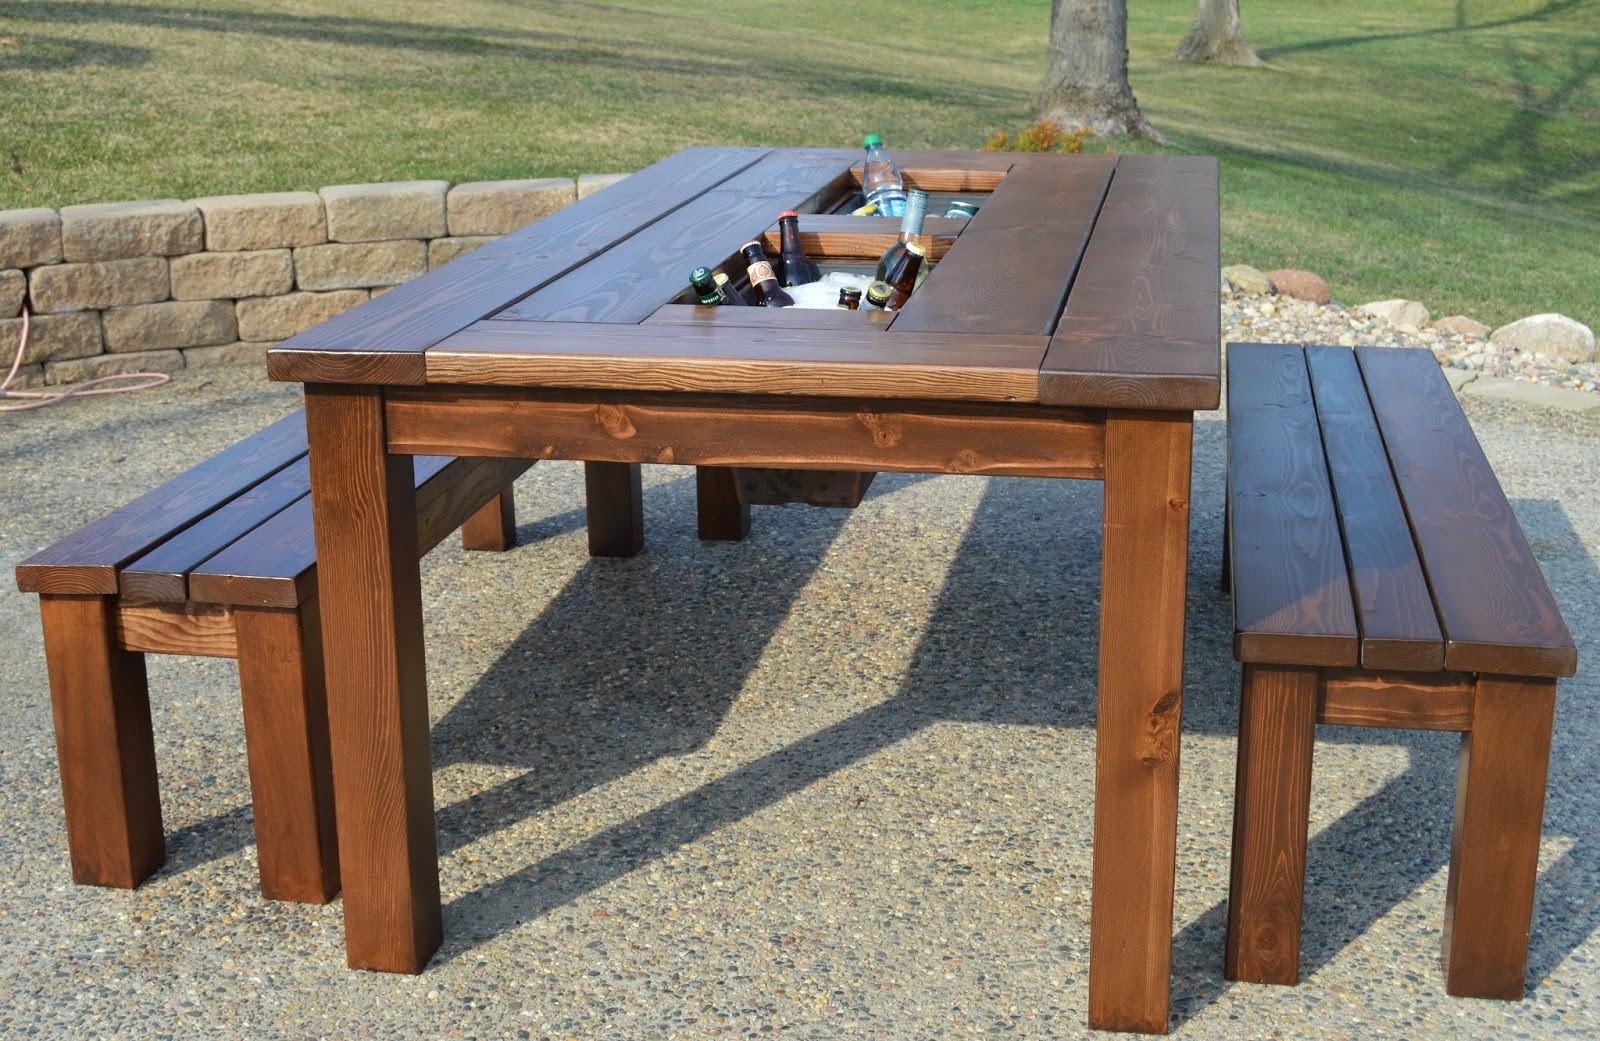 DIY Outdoor Wooden Table  Make Outdoor End Table